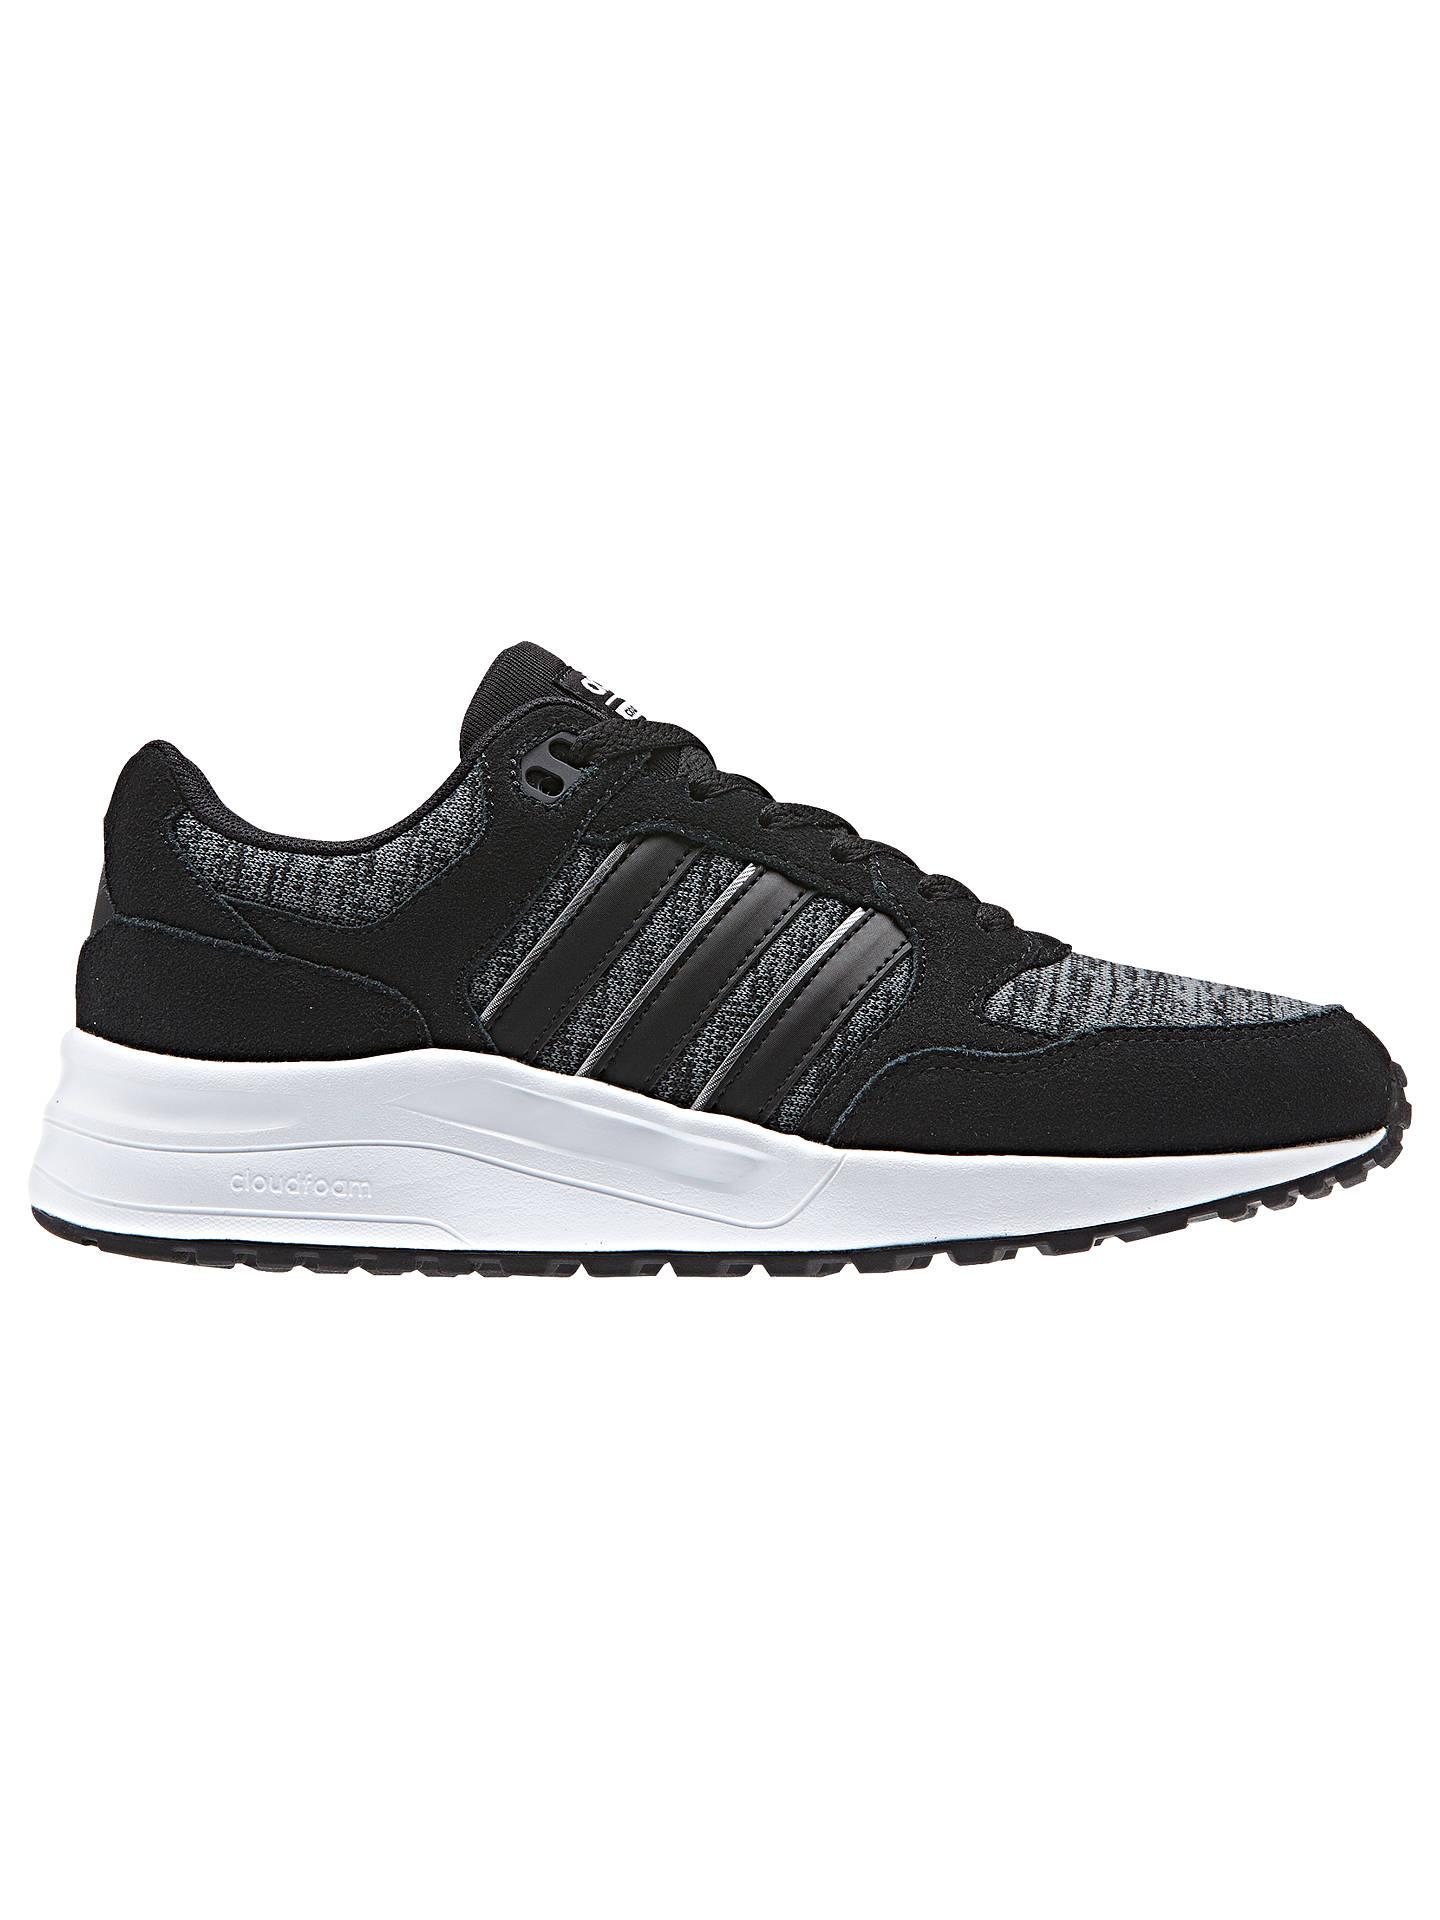 Adidas At TrainersBlack Women's Lewis Cloudfoam John 20k Super Y7ygbf6